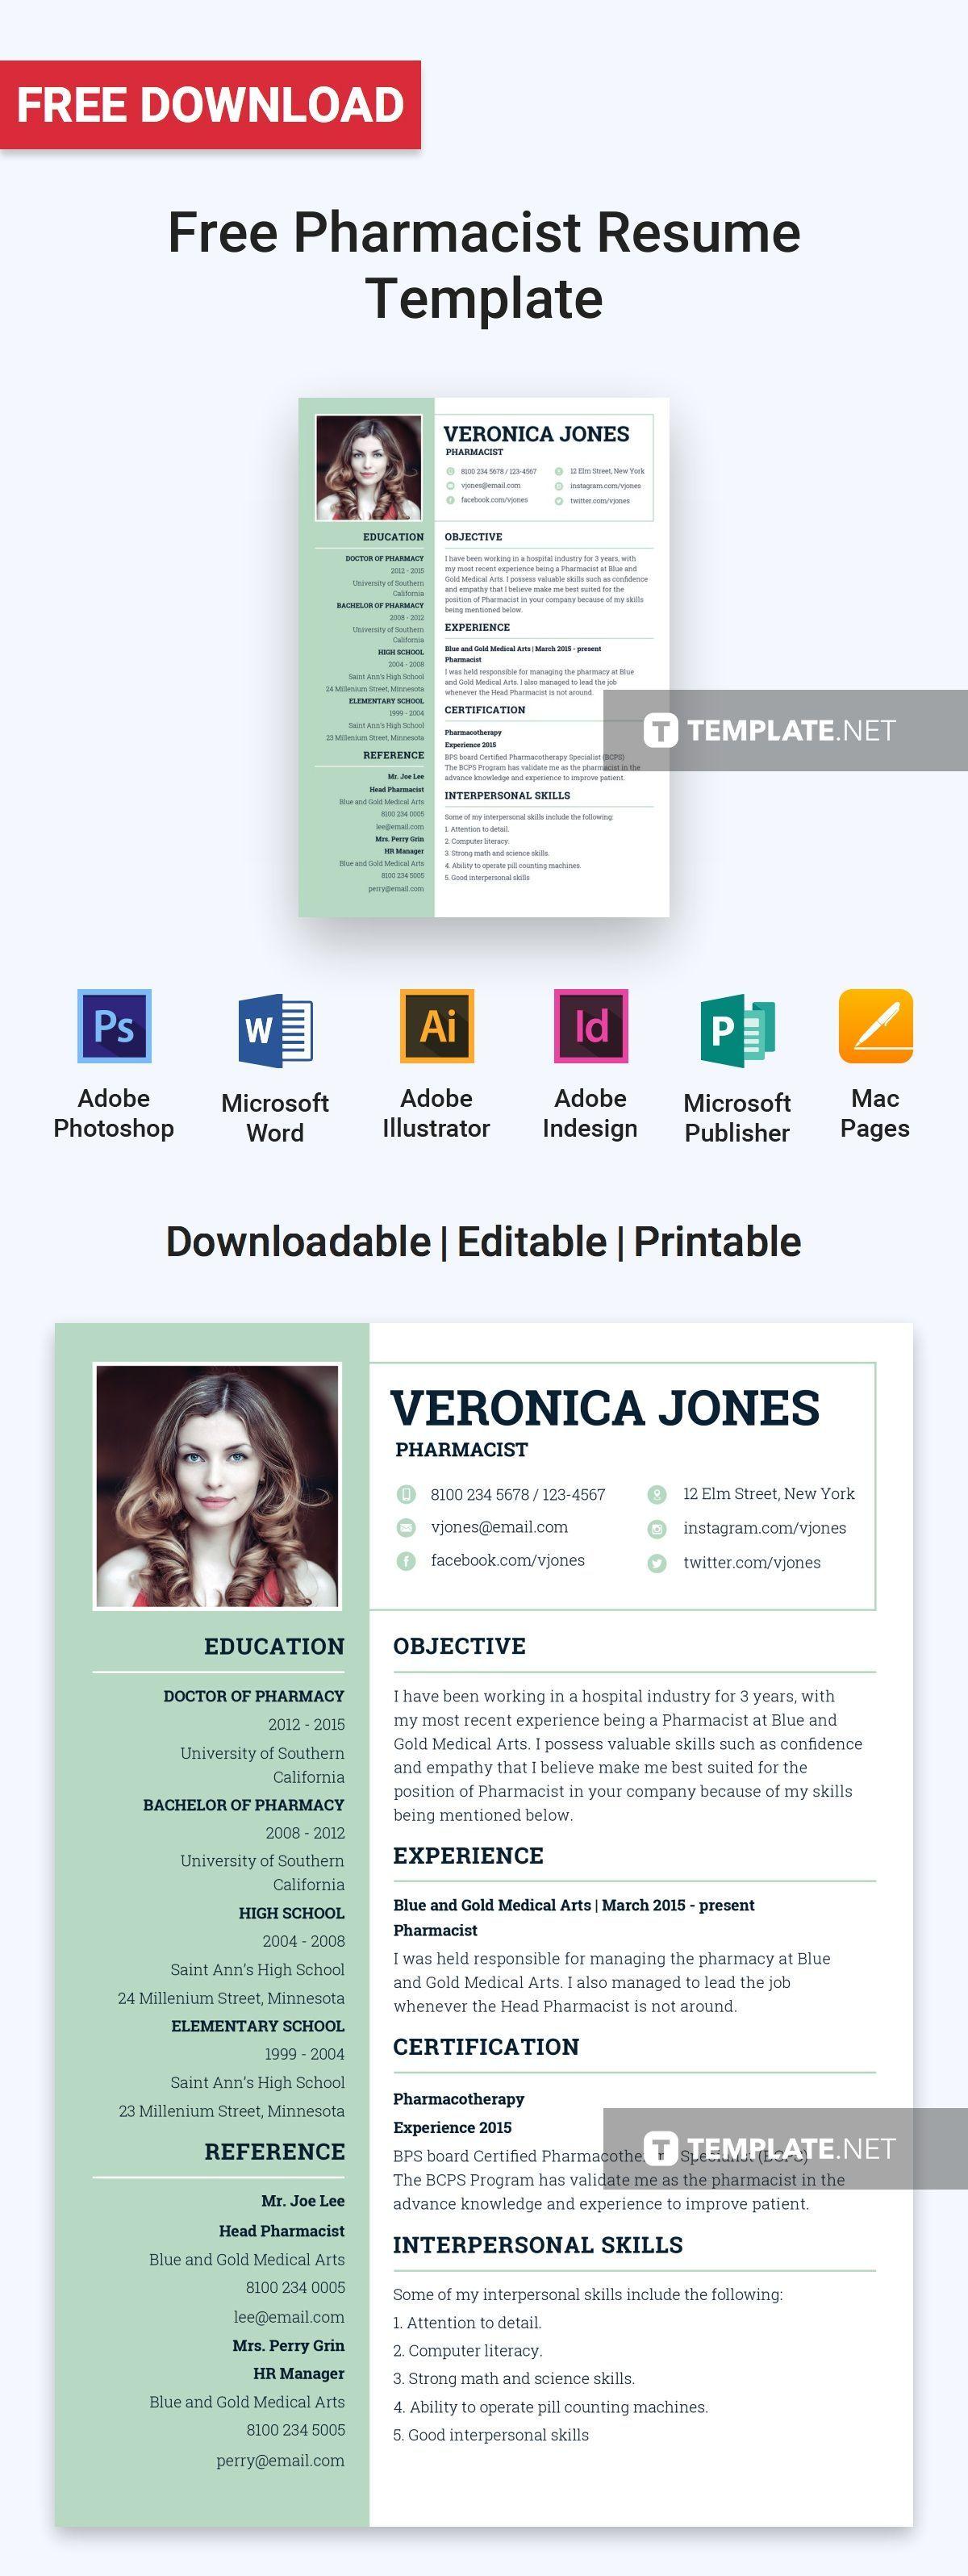 Modern resume template free, Resume template, Resume